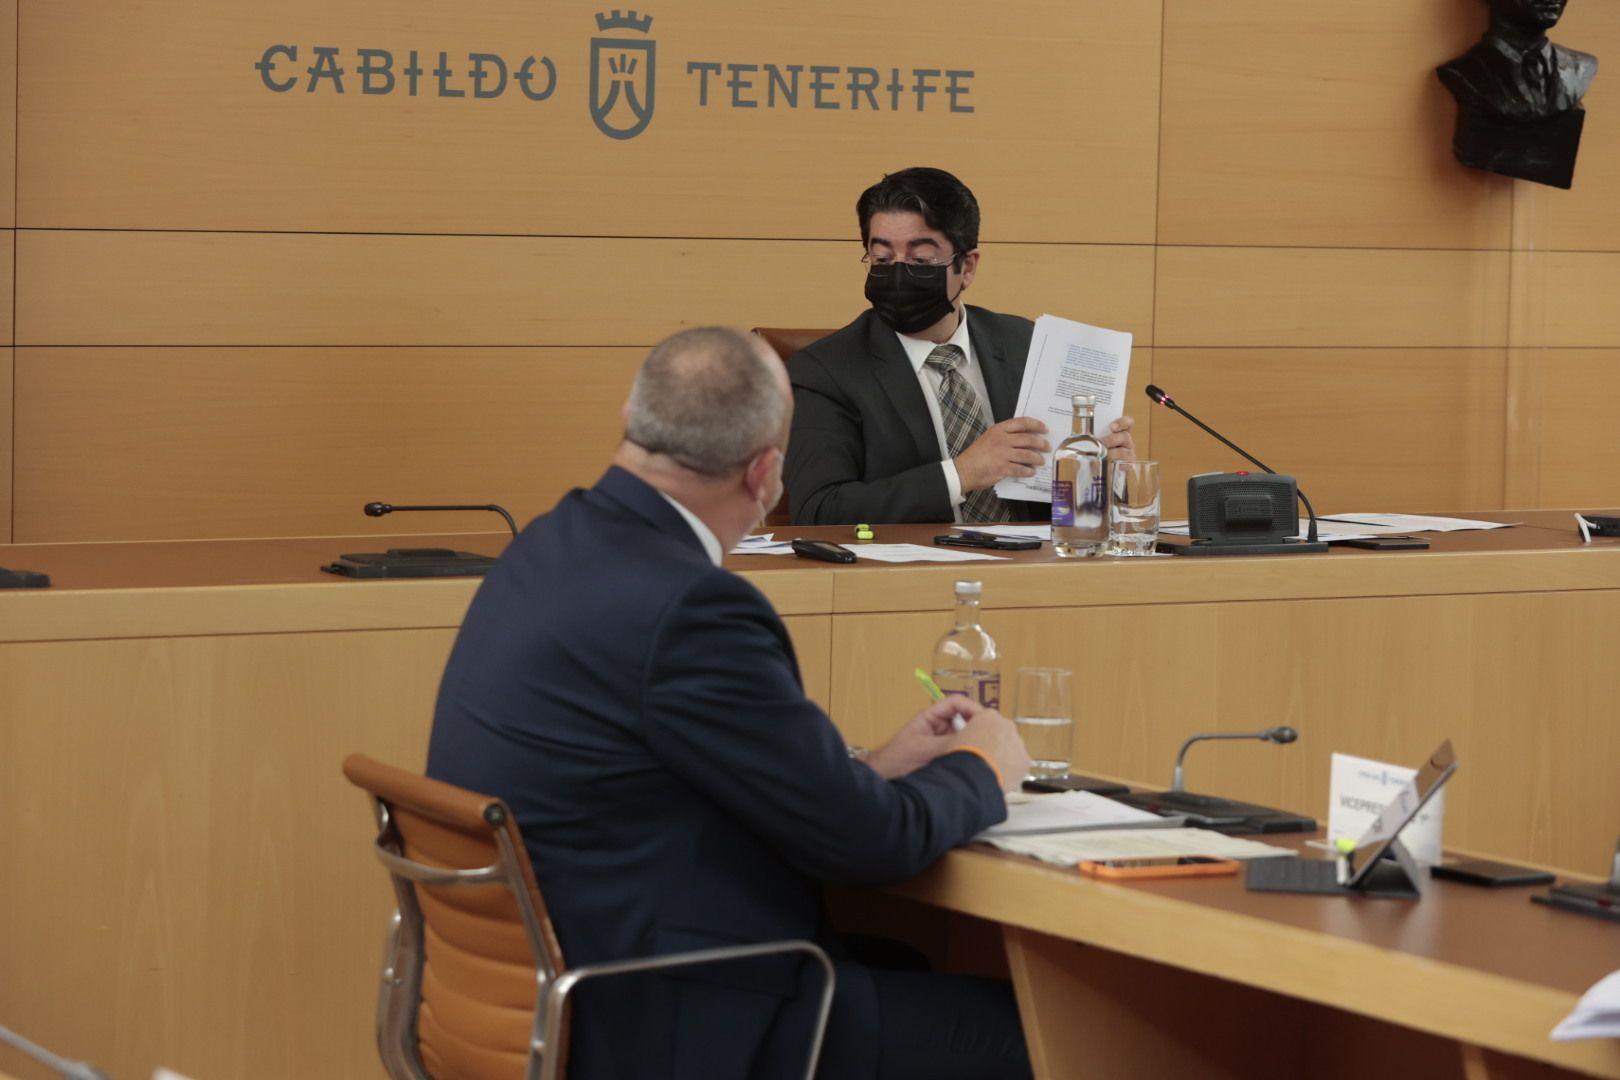 Pleno del Cabildo de Tenerife 01/03/2021